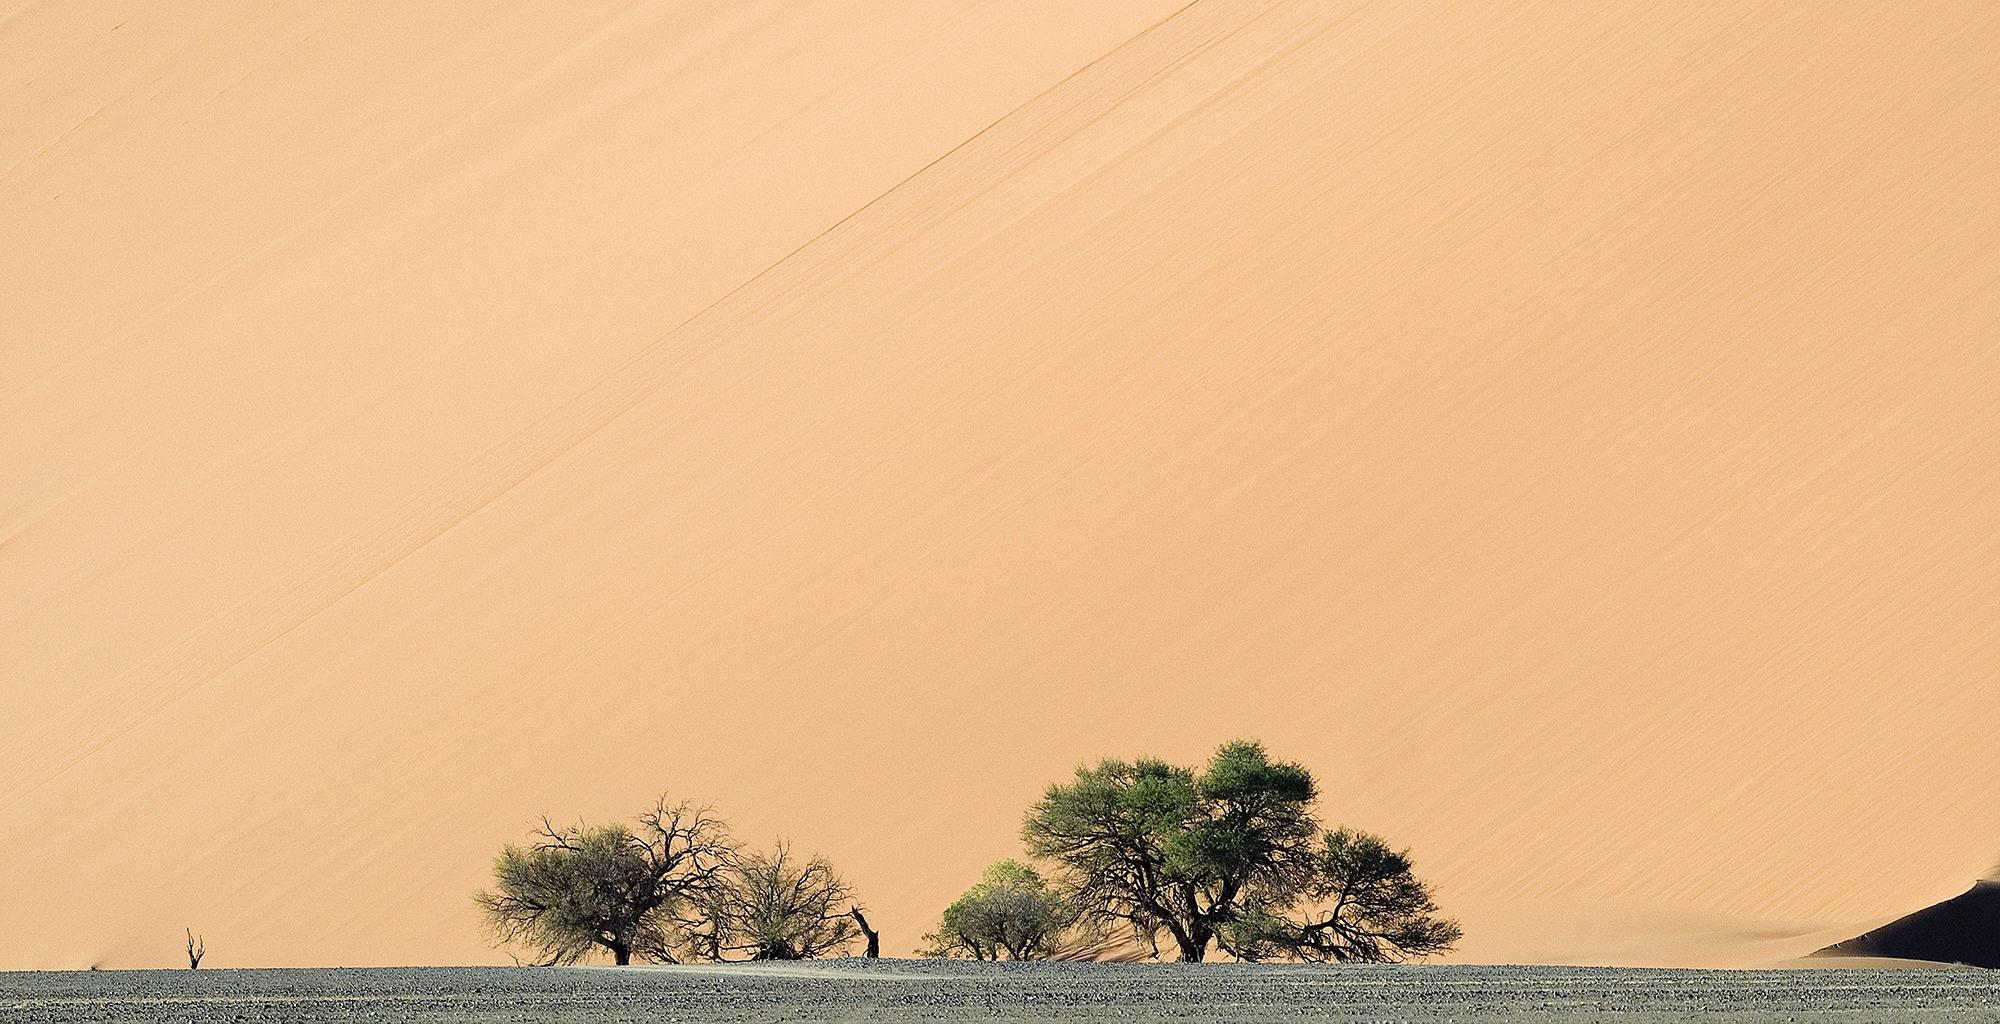 Namibia-Greater-Sossusvlei-Landscape-Tree